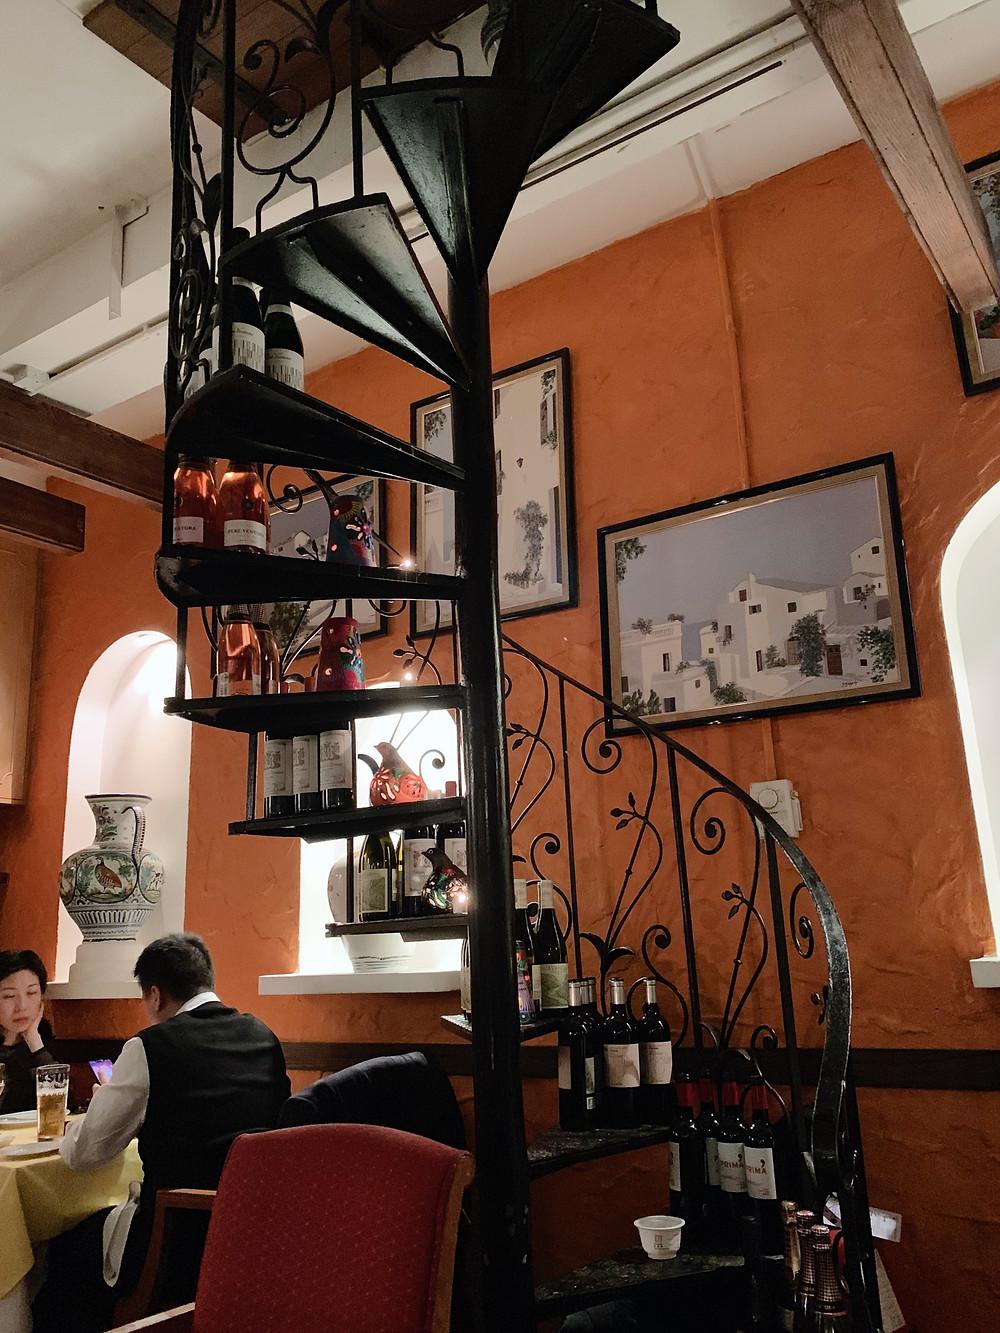 Ole Spanish restaurant in Hong Kong